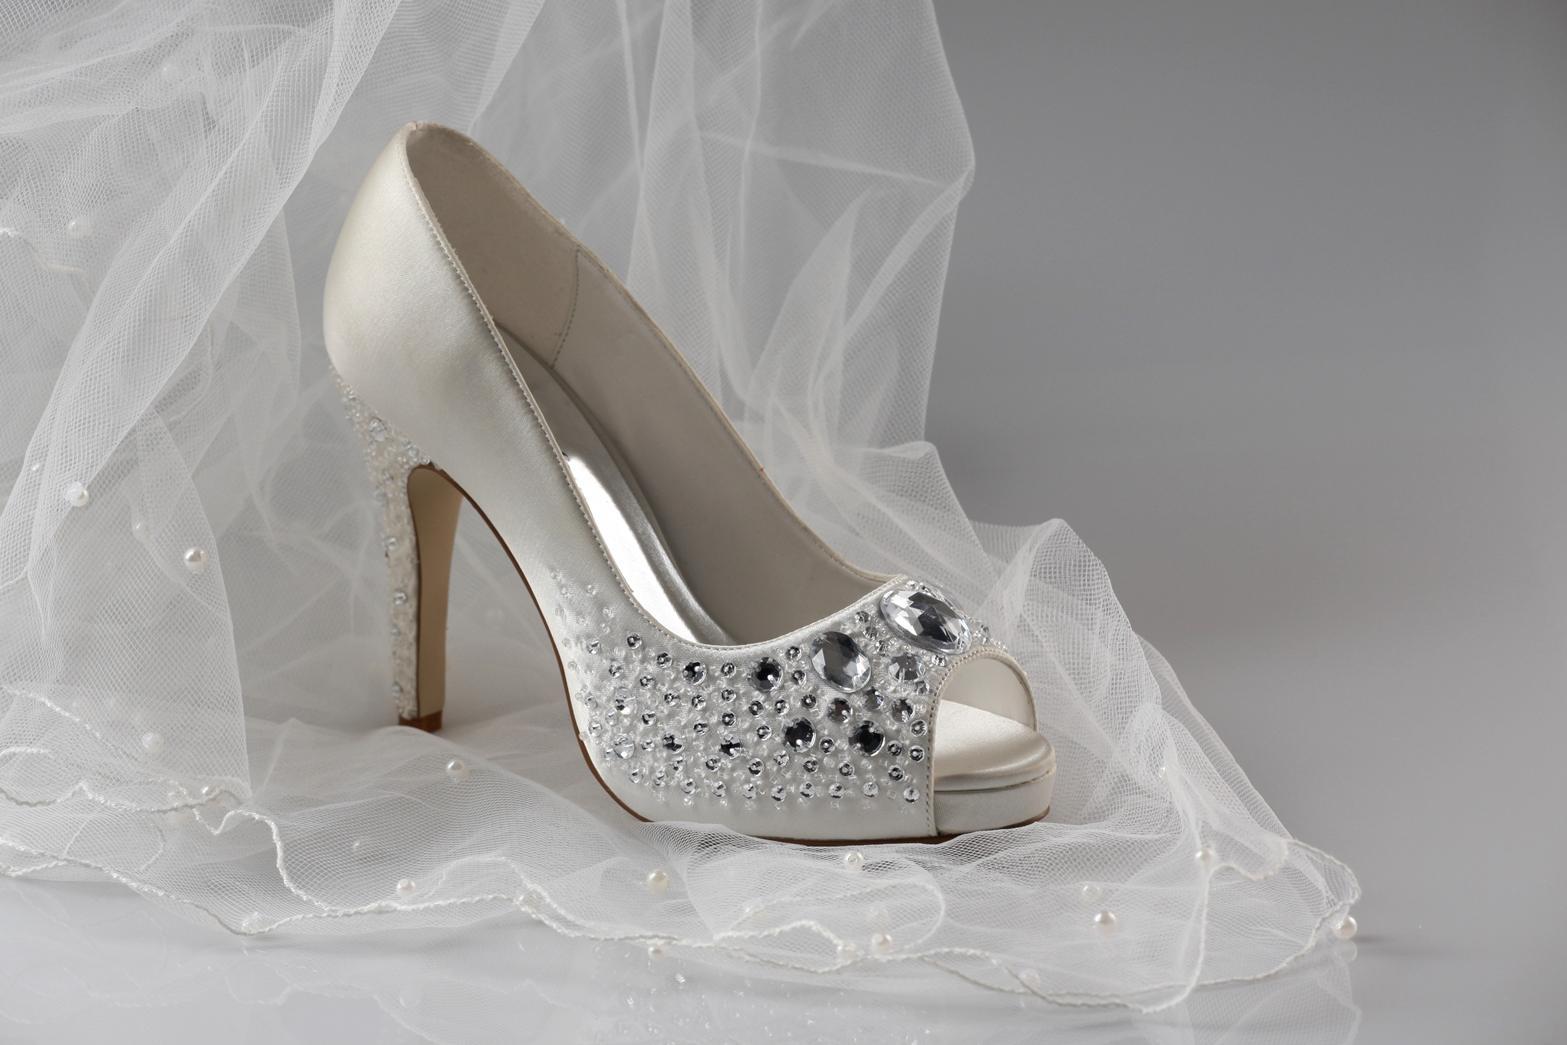 VICTORIA - Westerleigh cipő. 23.900 Ft